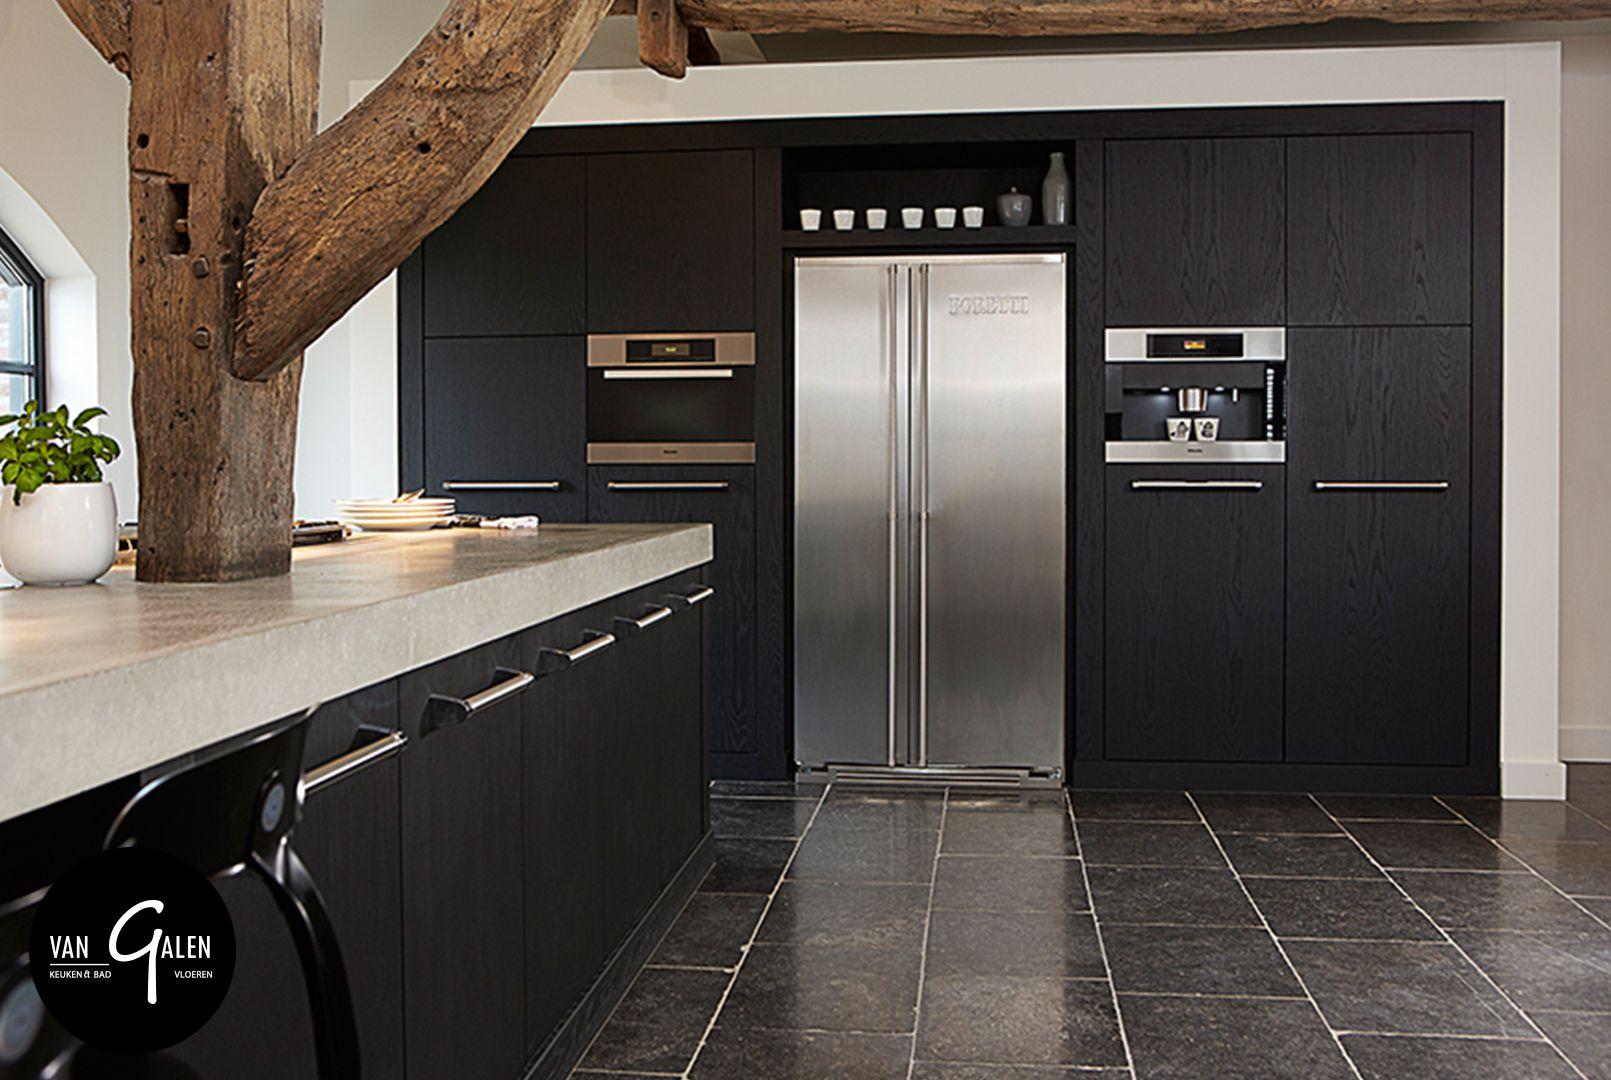 Van Galen Keukens : Gerealiseerde keukens van galen keuken bad keukens